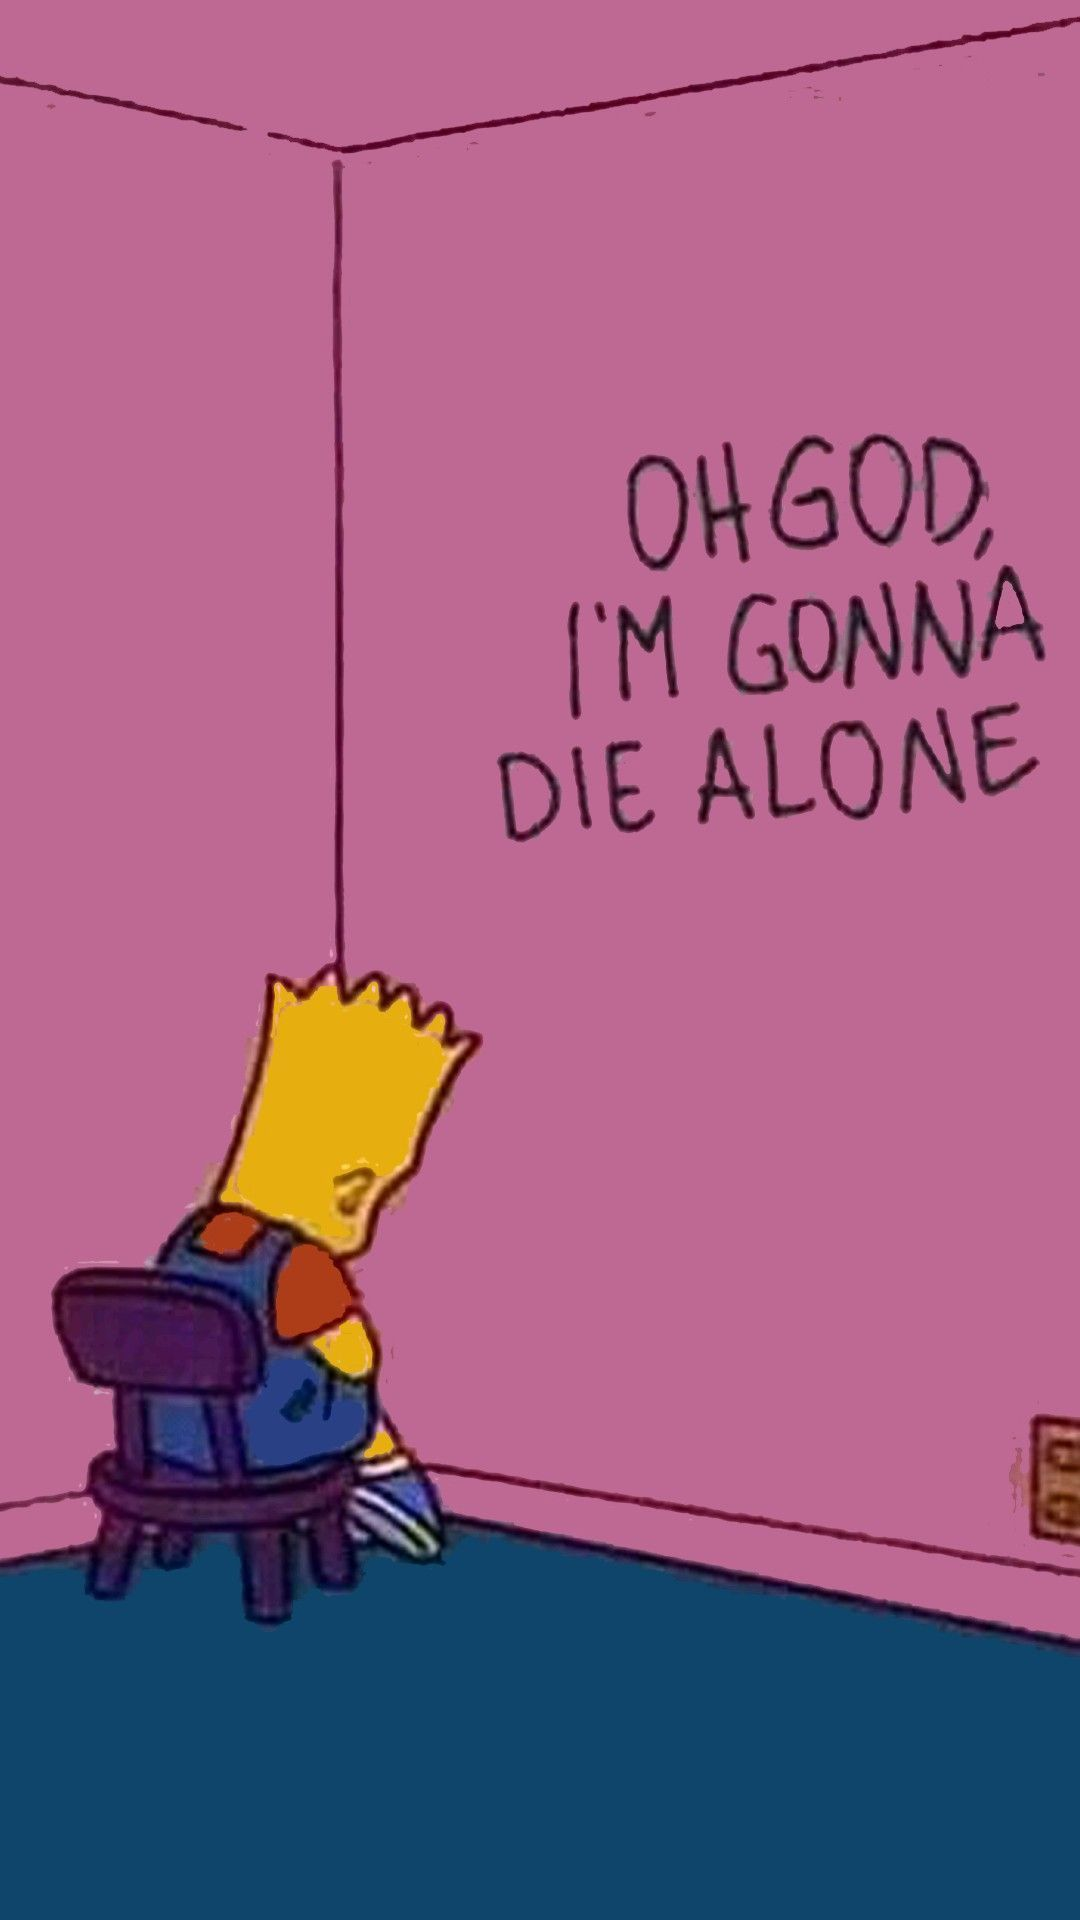 Sad Simpsons Wallpapers Top Free Sad Simpsons Backgrounds